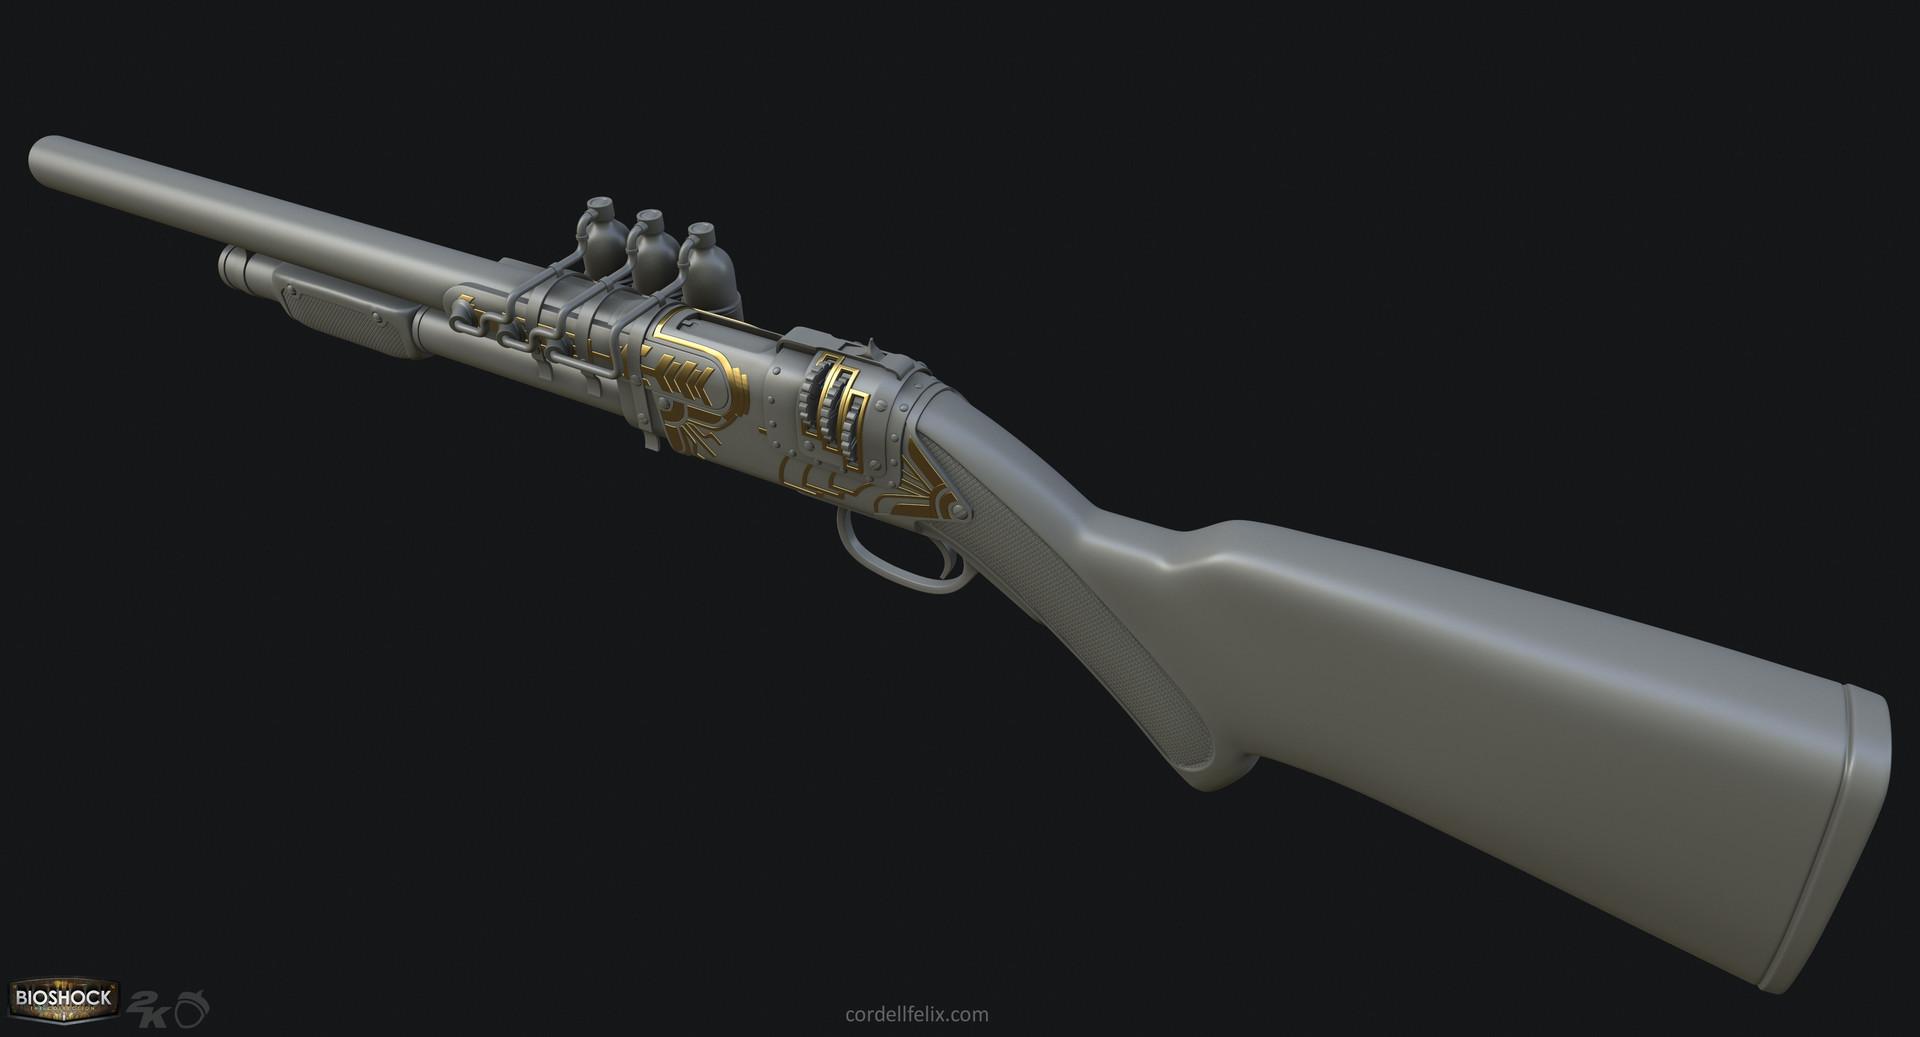 Cordell felix cordellfelix bioshock shotgun hp 06